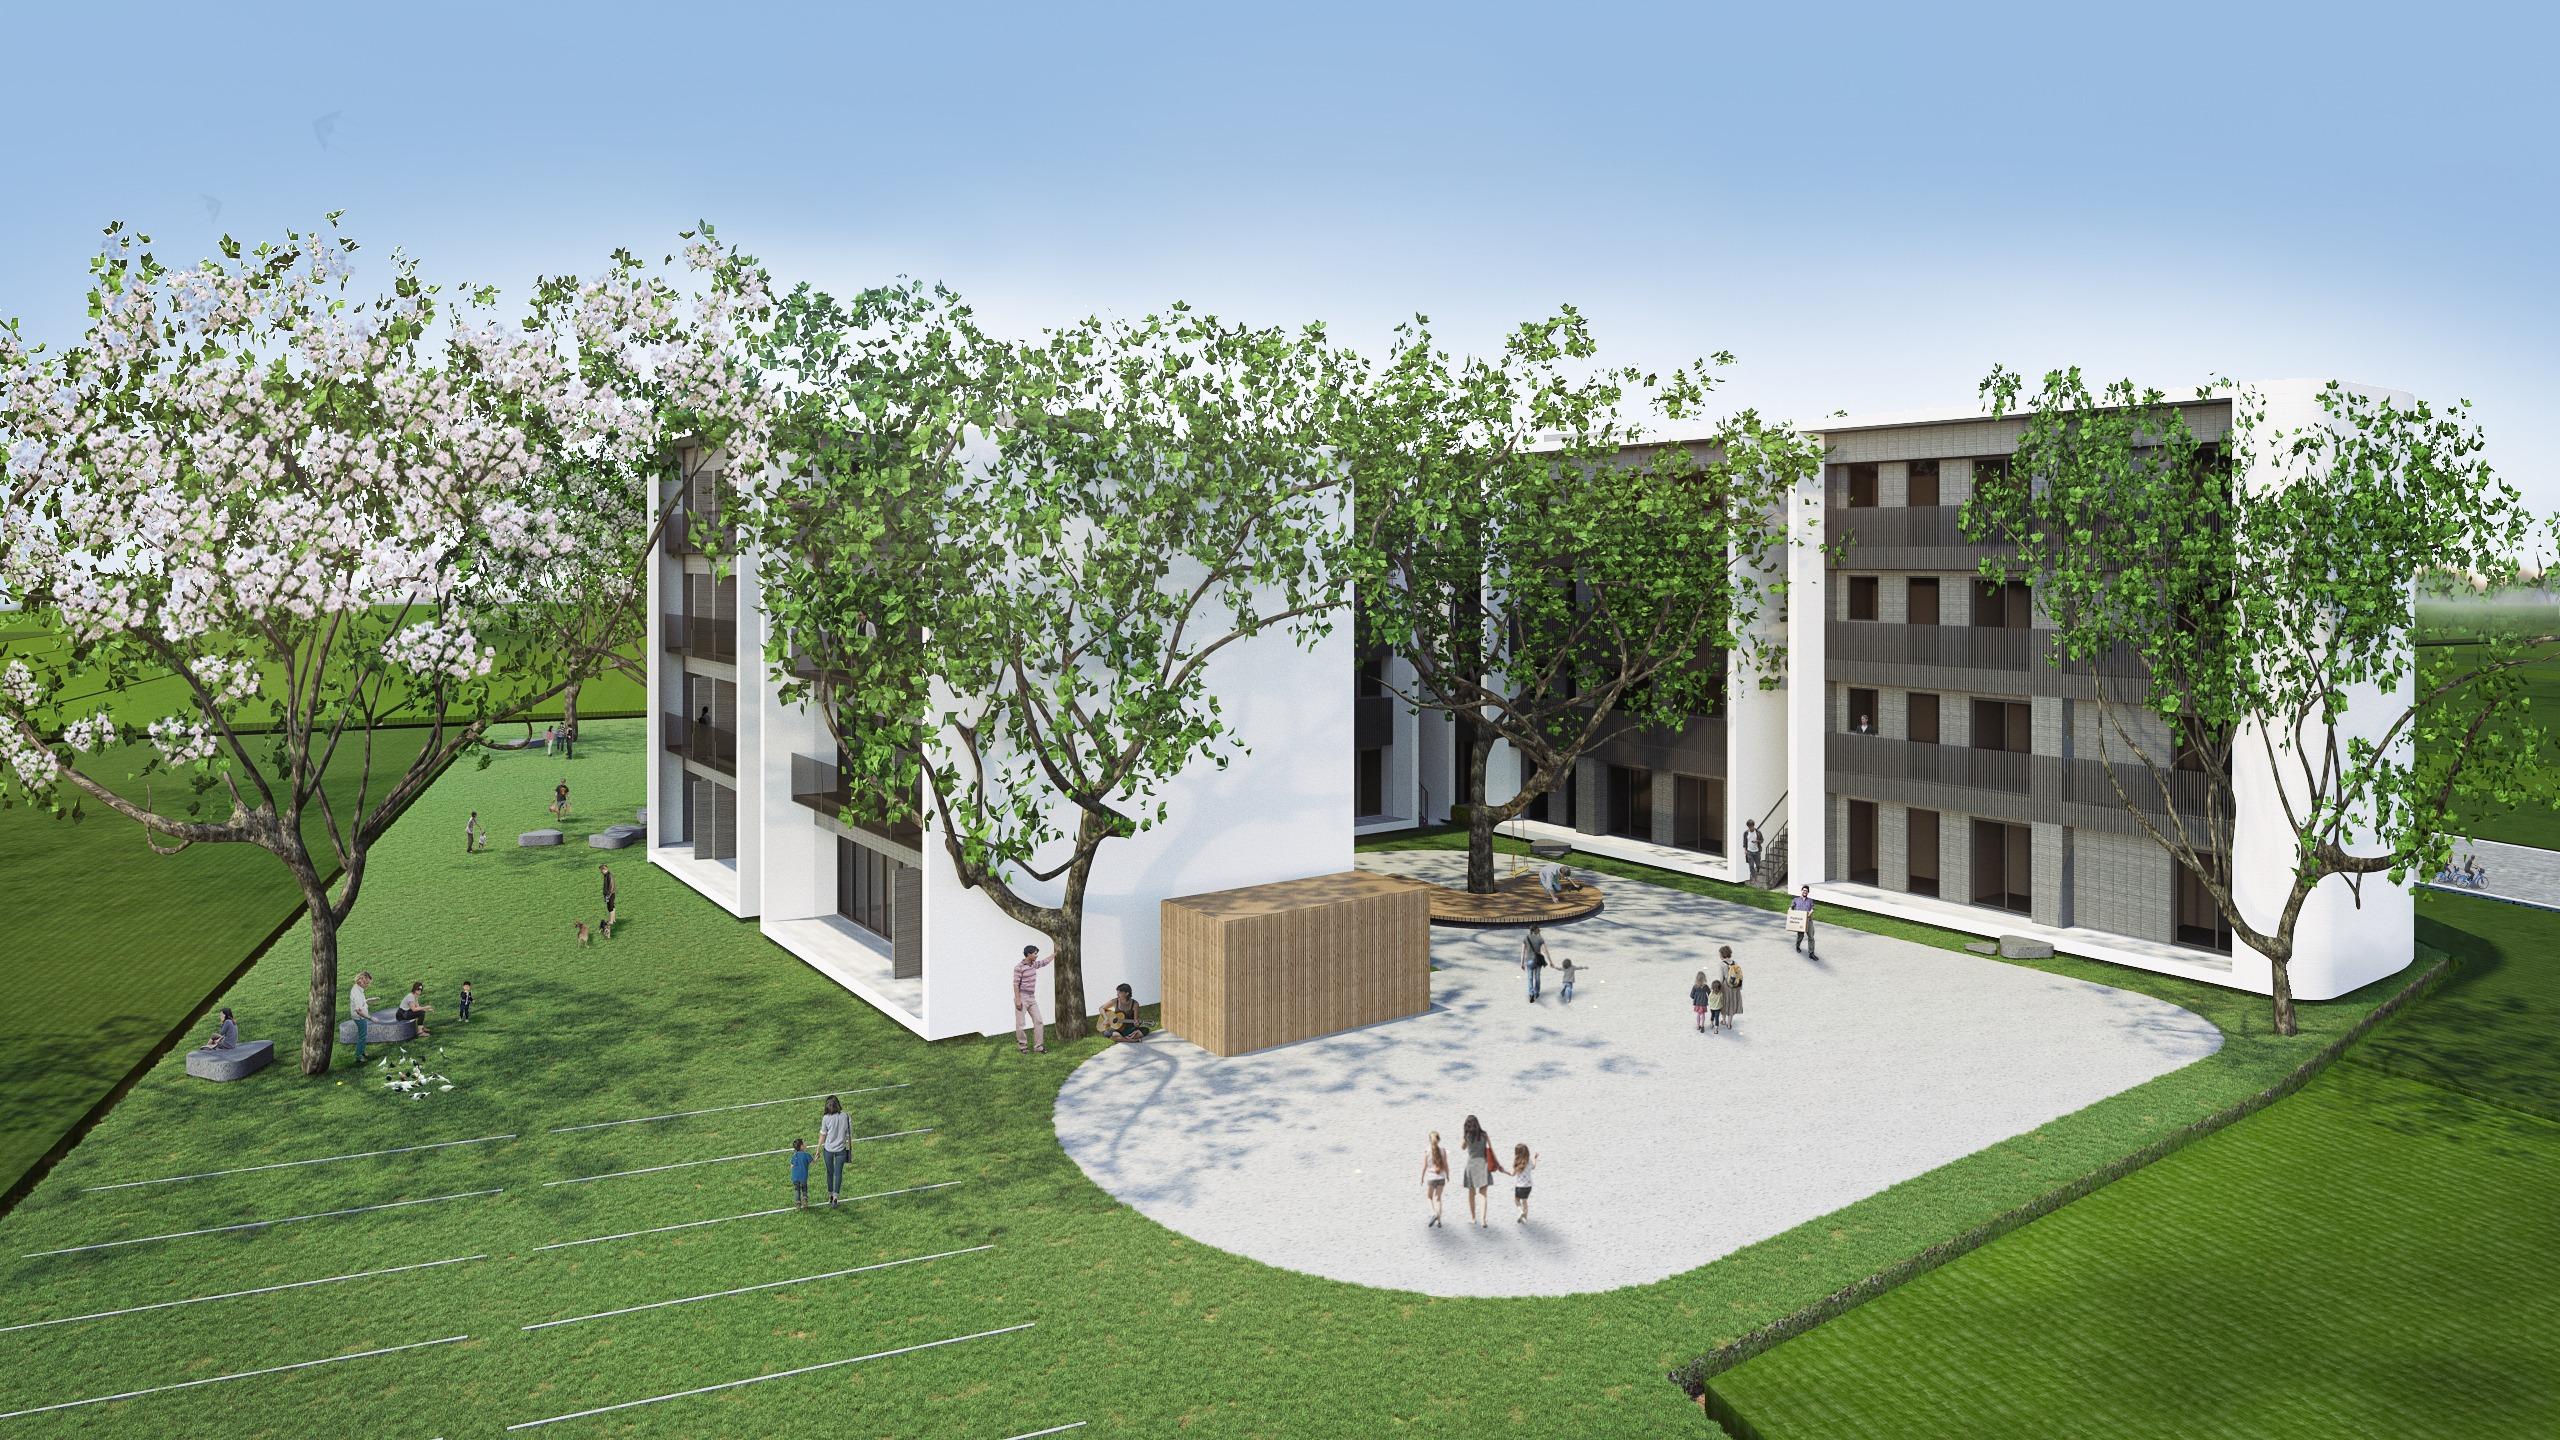 德築-DEZU-project-Zumi-architecture-3Drendering-3